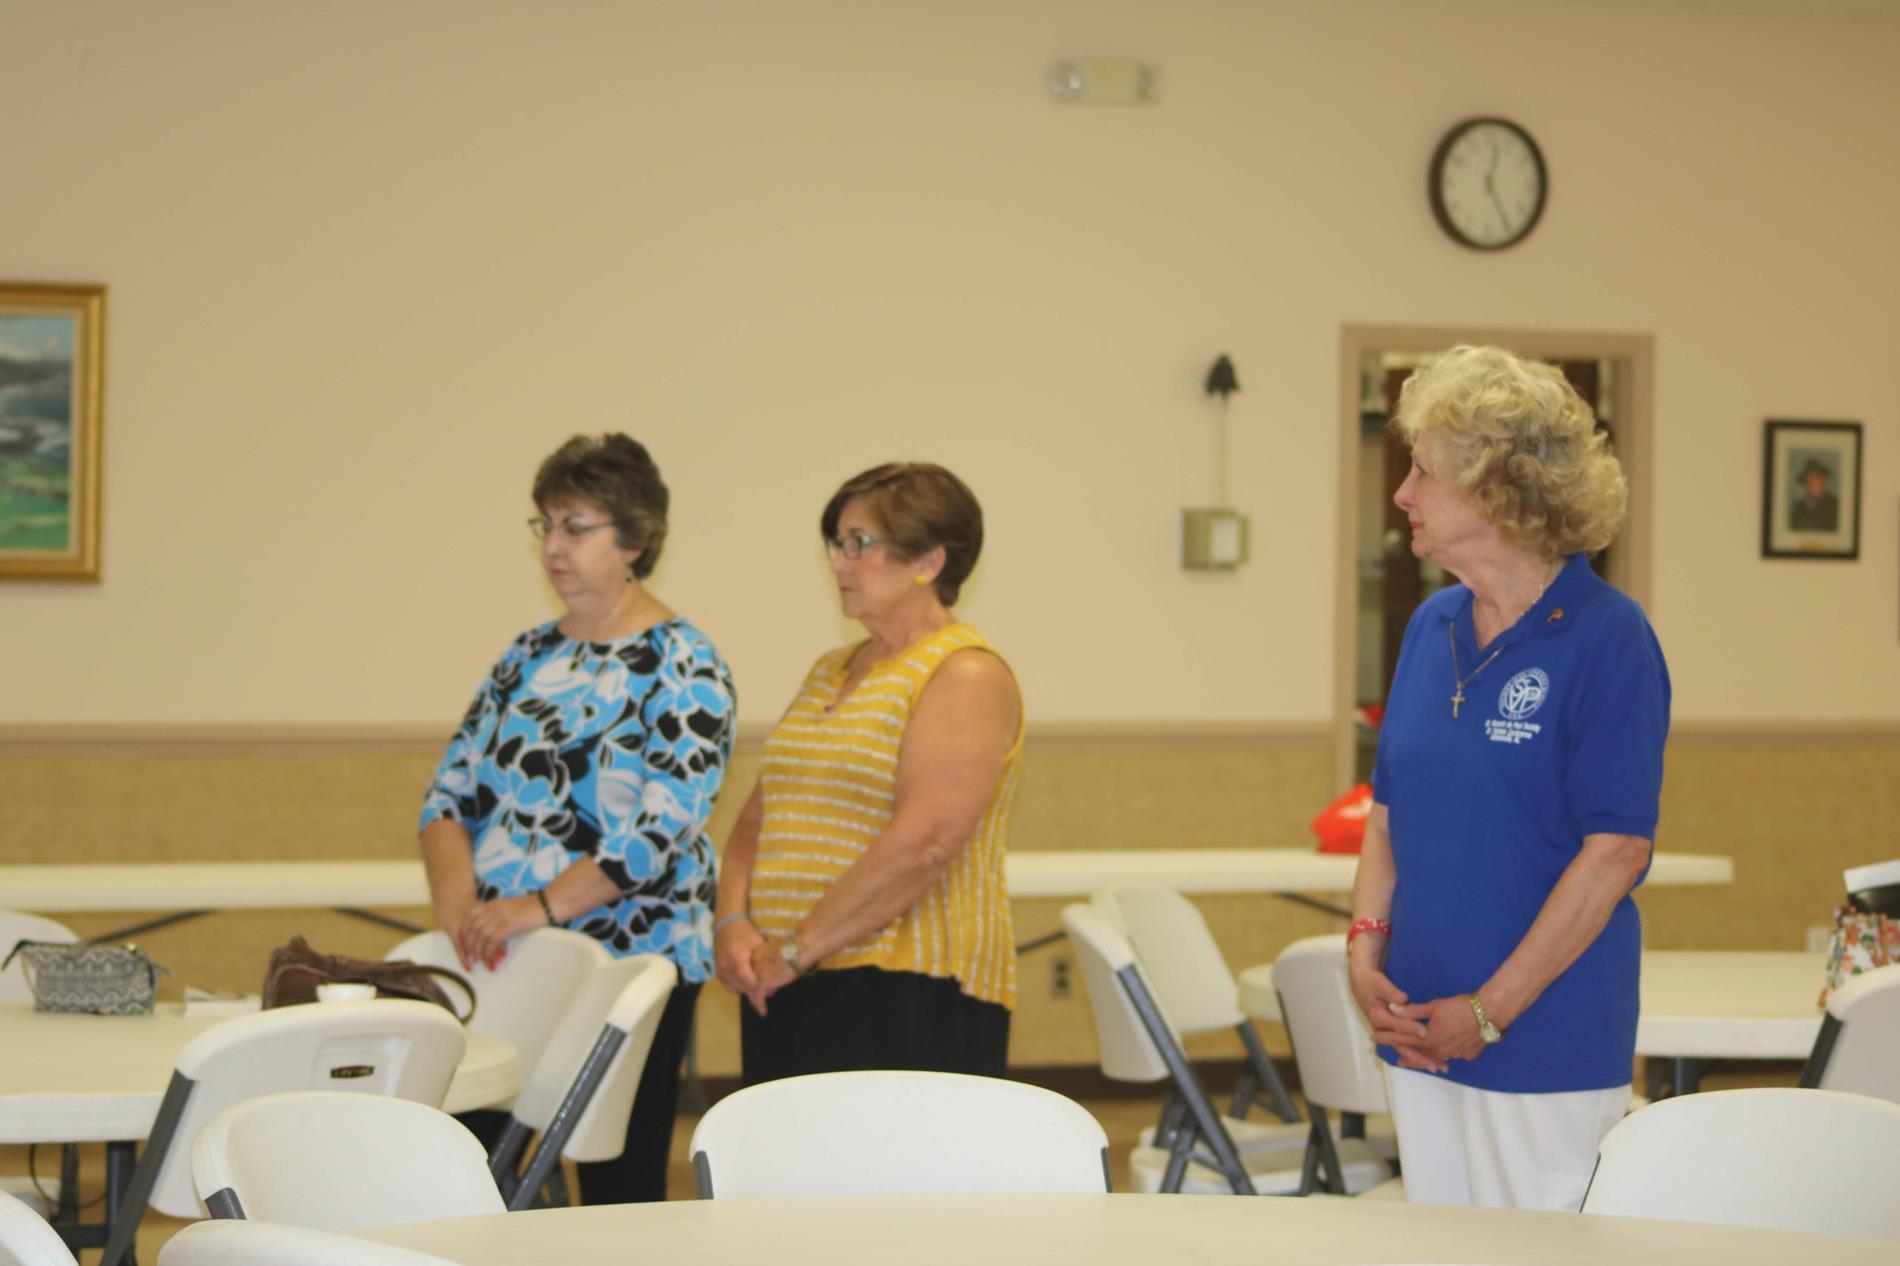 Members watch presentation